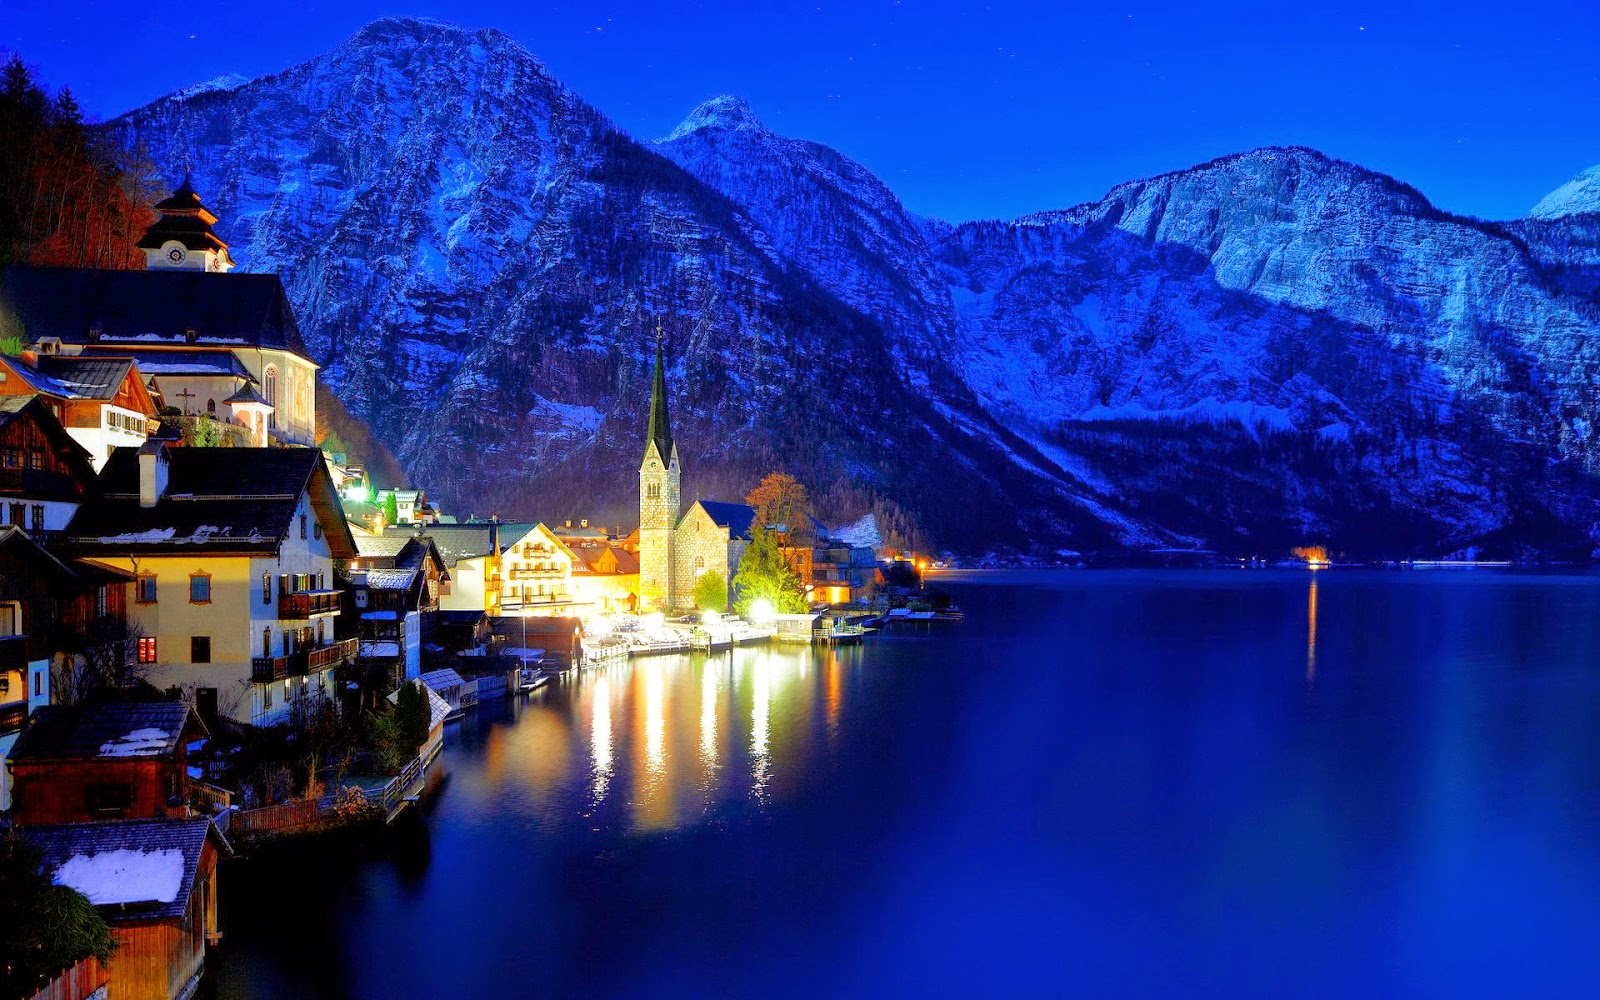 Most Popular Wallpapers For Desktop: Austria Desktop HD (high Definition) Wallpapers